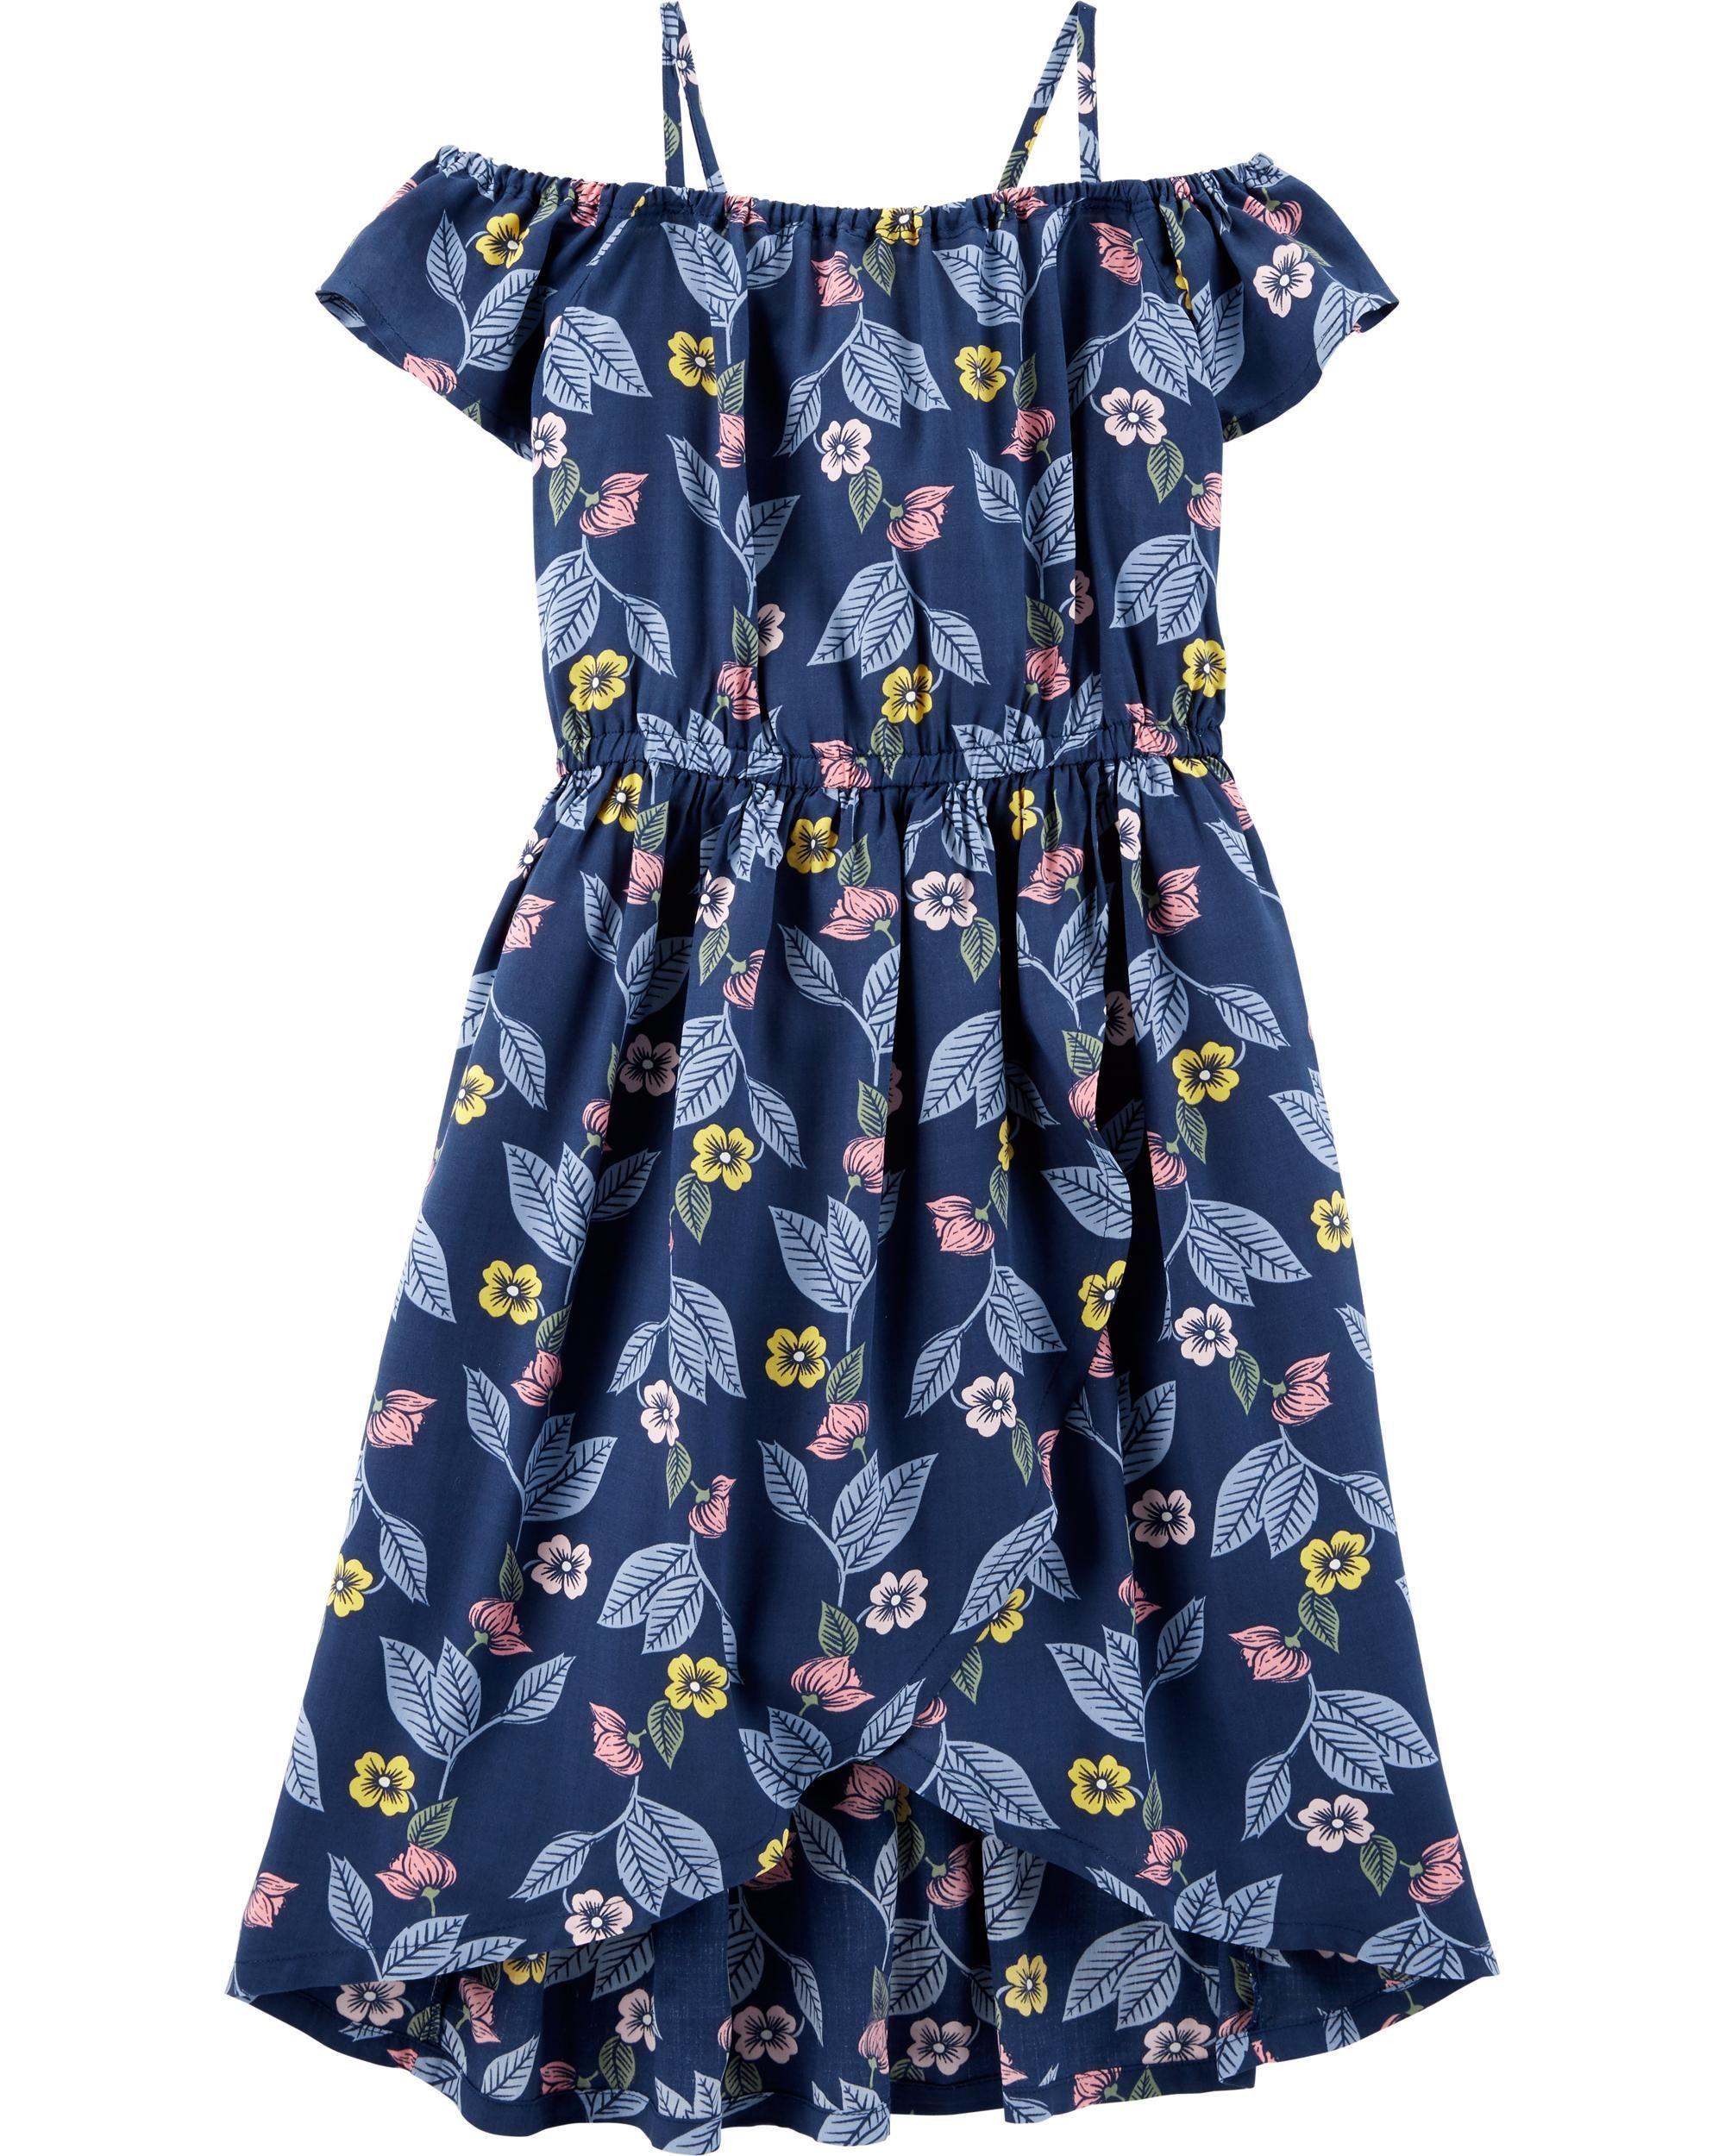 44+ Cold shoulder dress ideas